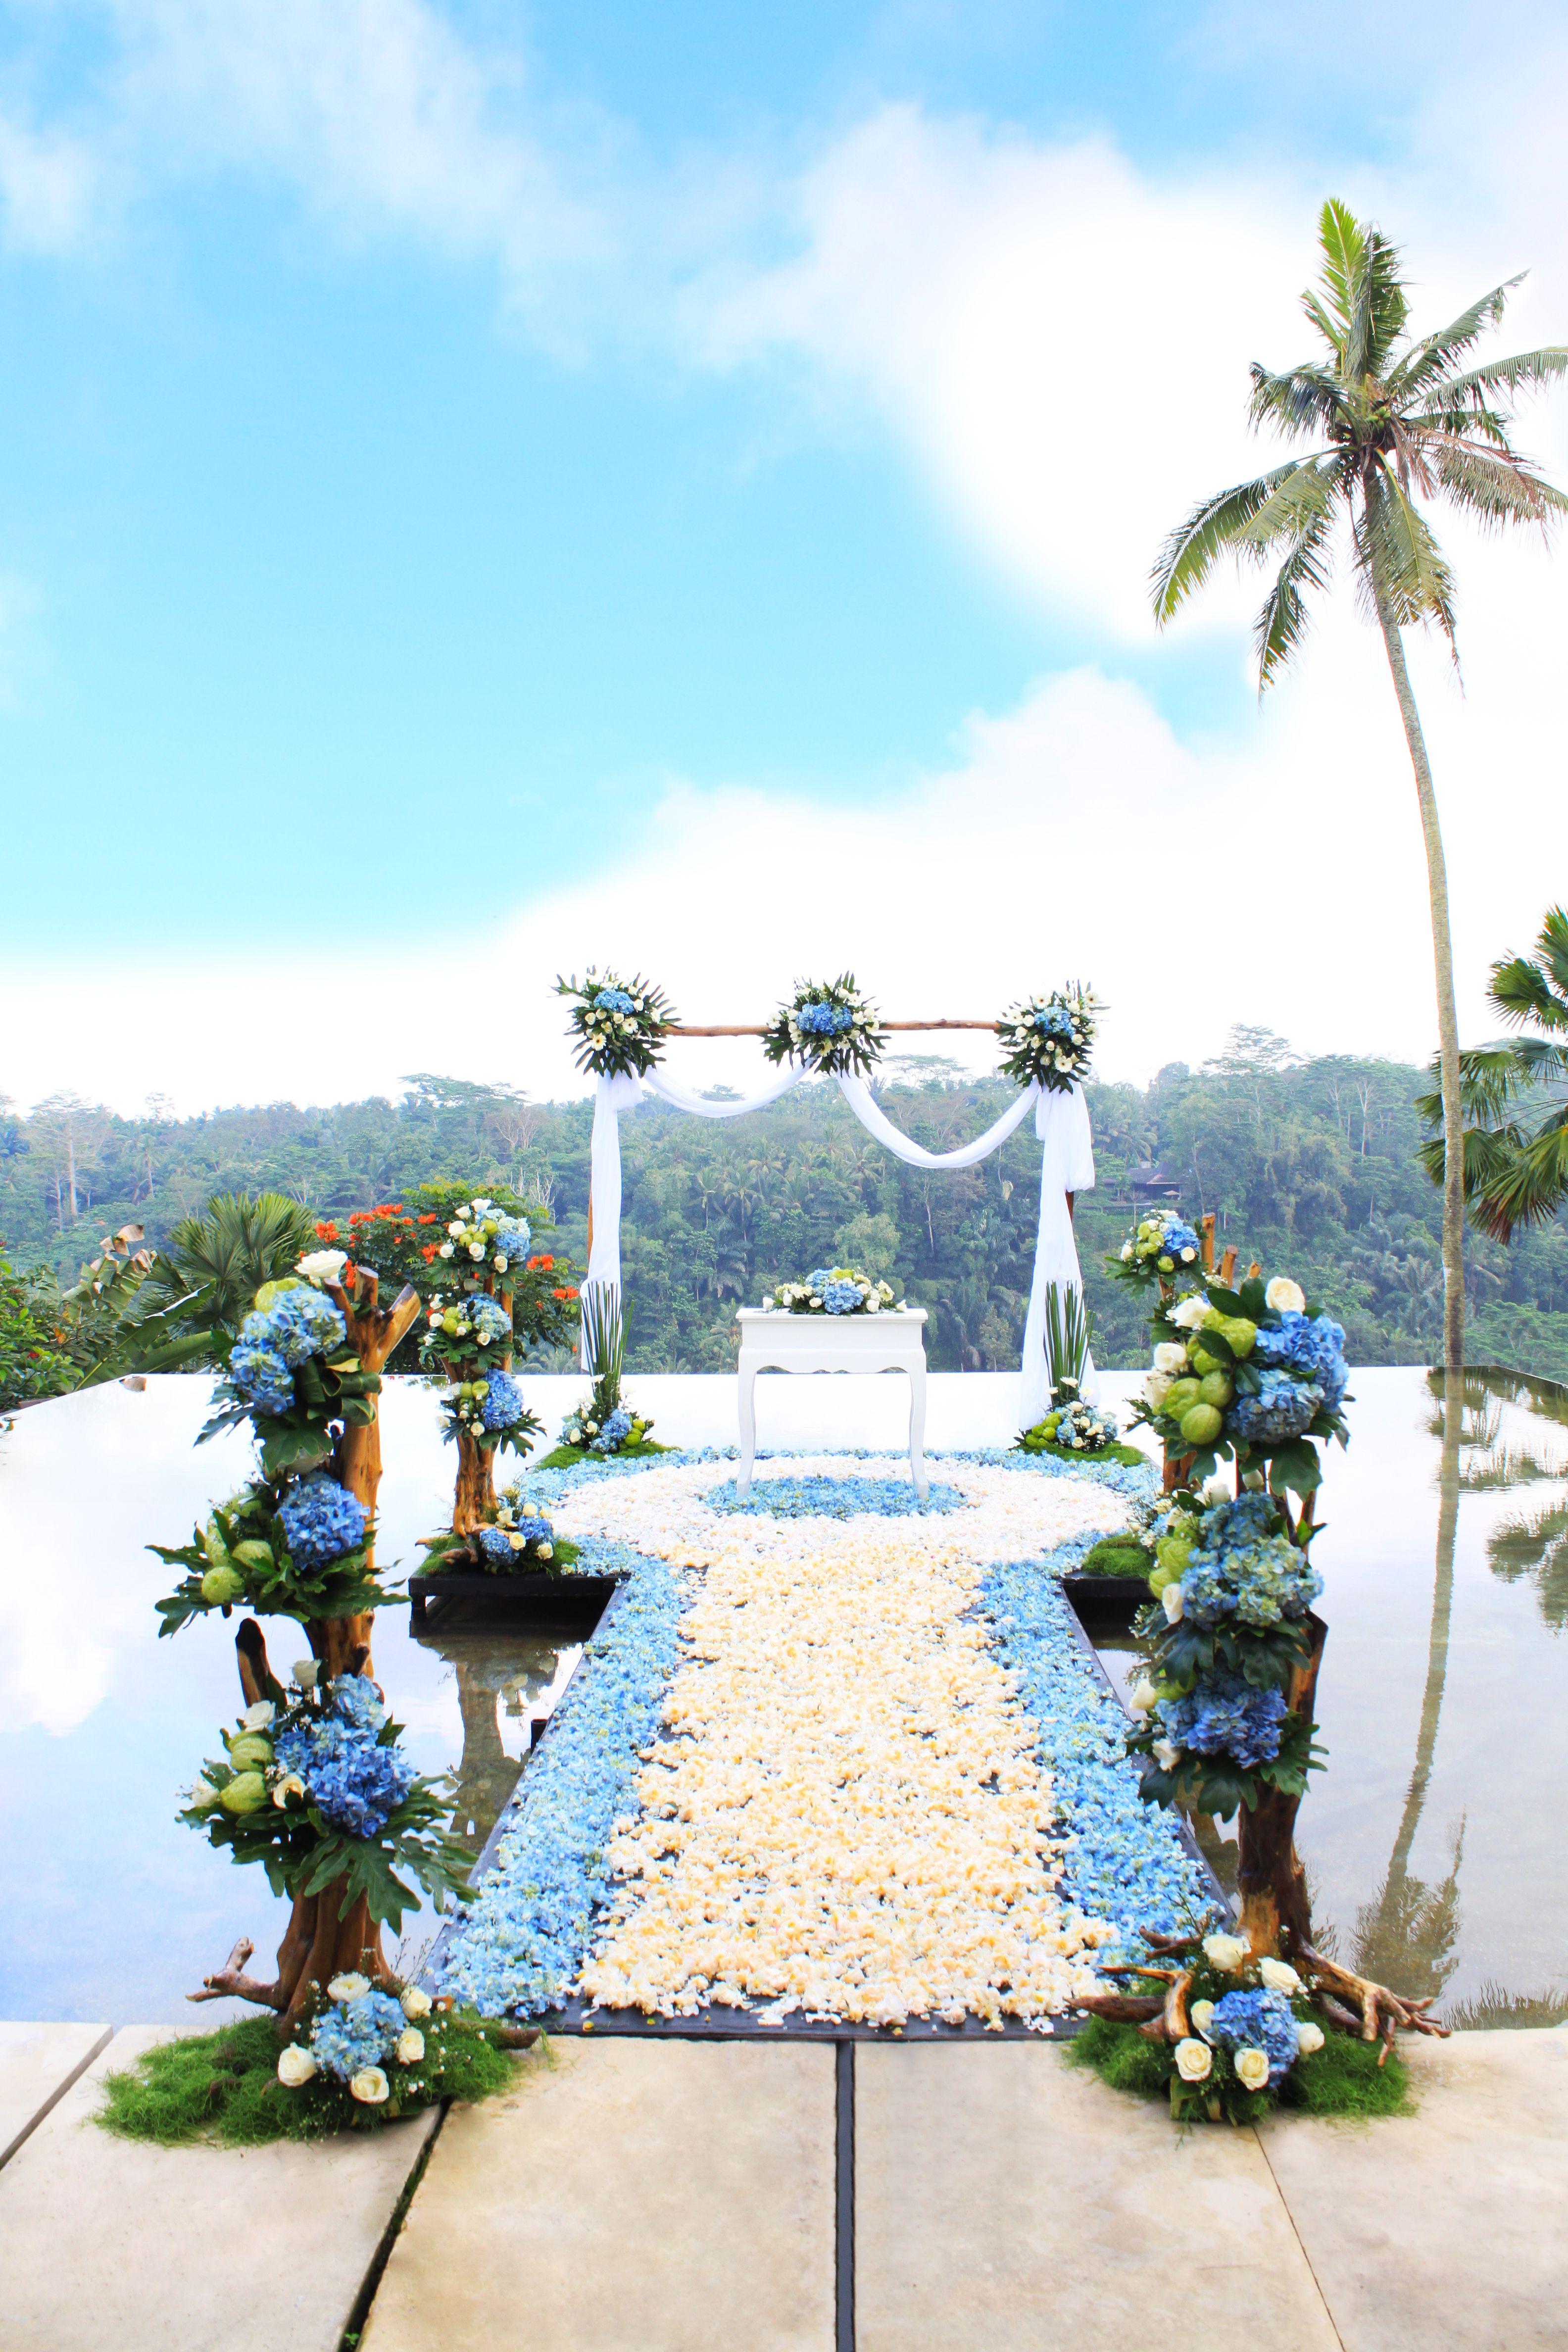 Rustic Style For Stunning Water Wedding In Bali Bali Wedding Venue